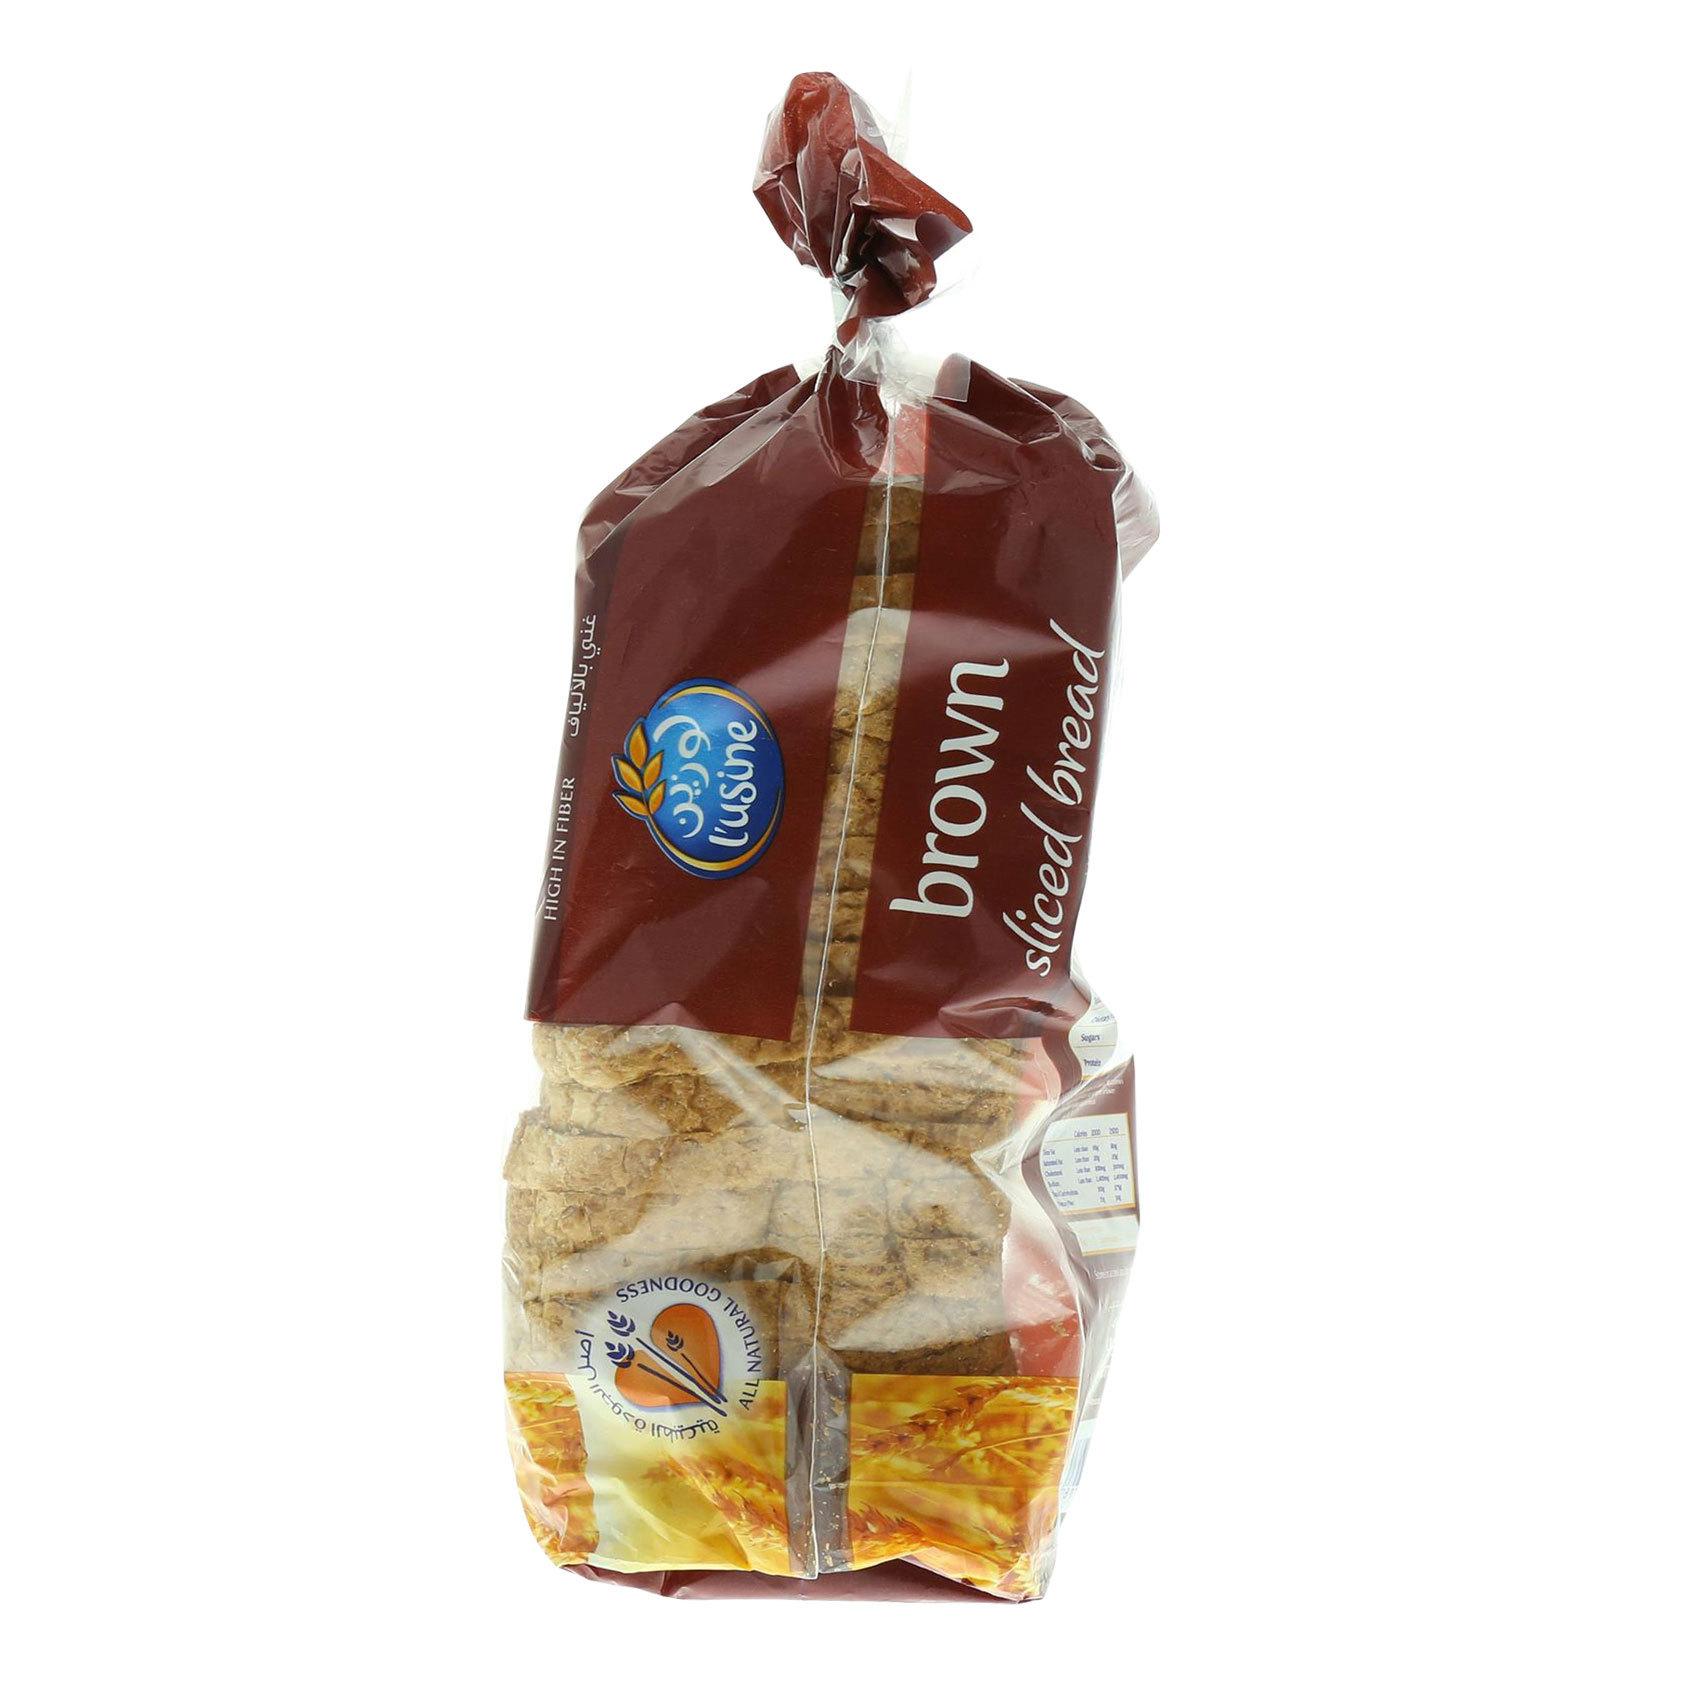 L'USINE BROWN SANDWICH BREAD 600 G